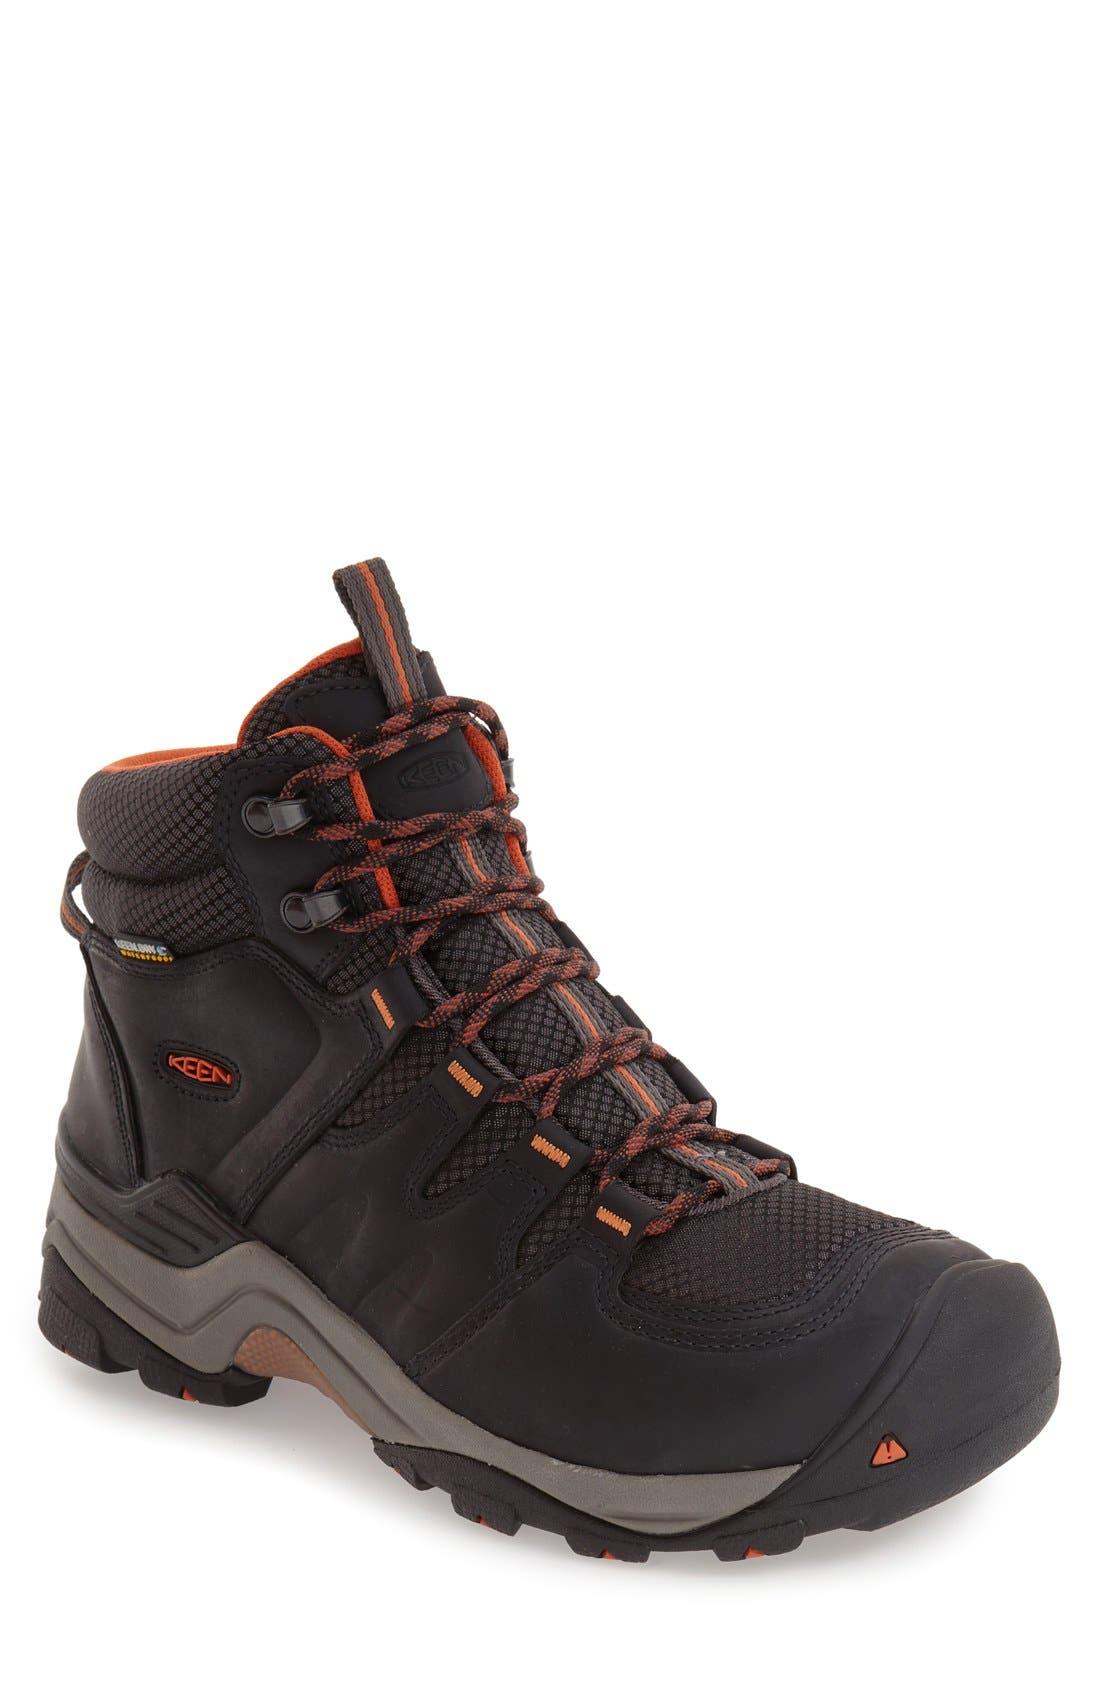 Gypsum II Waterproof Hiking Boot,                         Main,                         color, BLACK NUBUCK LEATHER